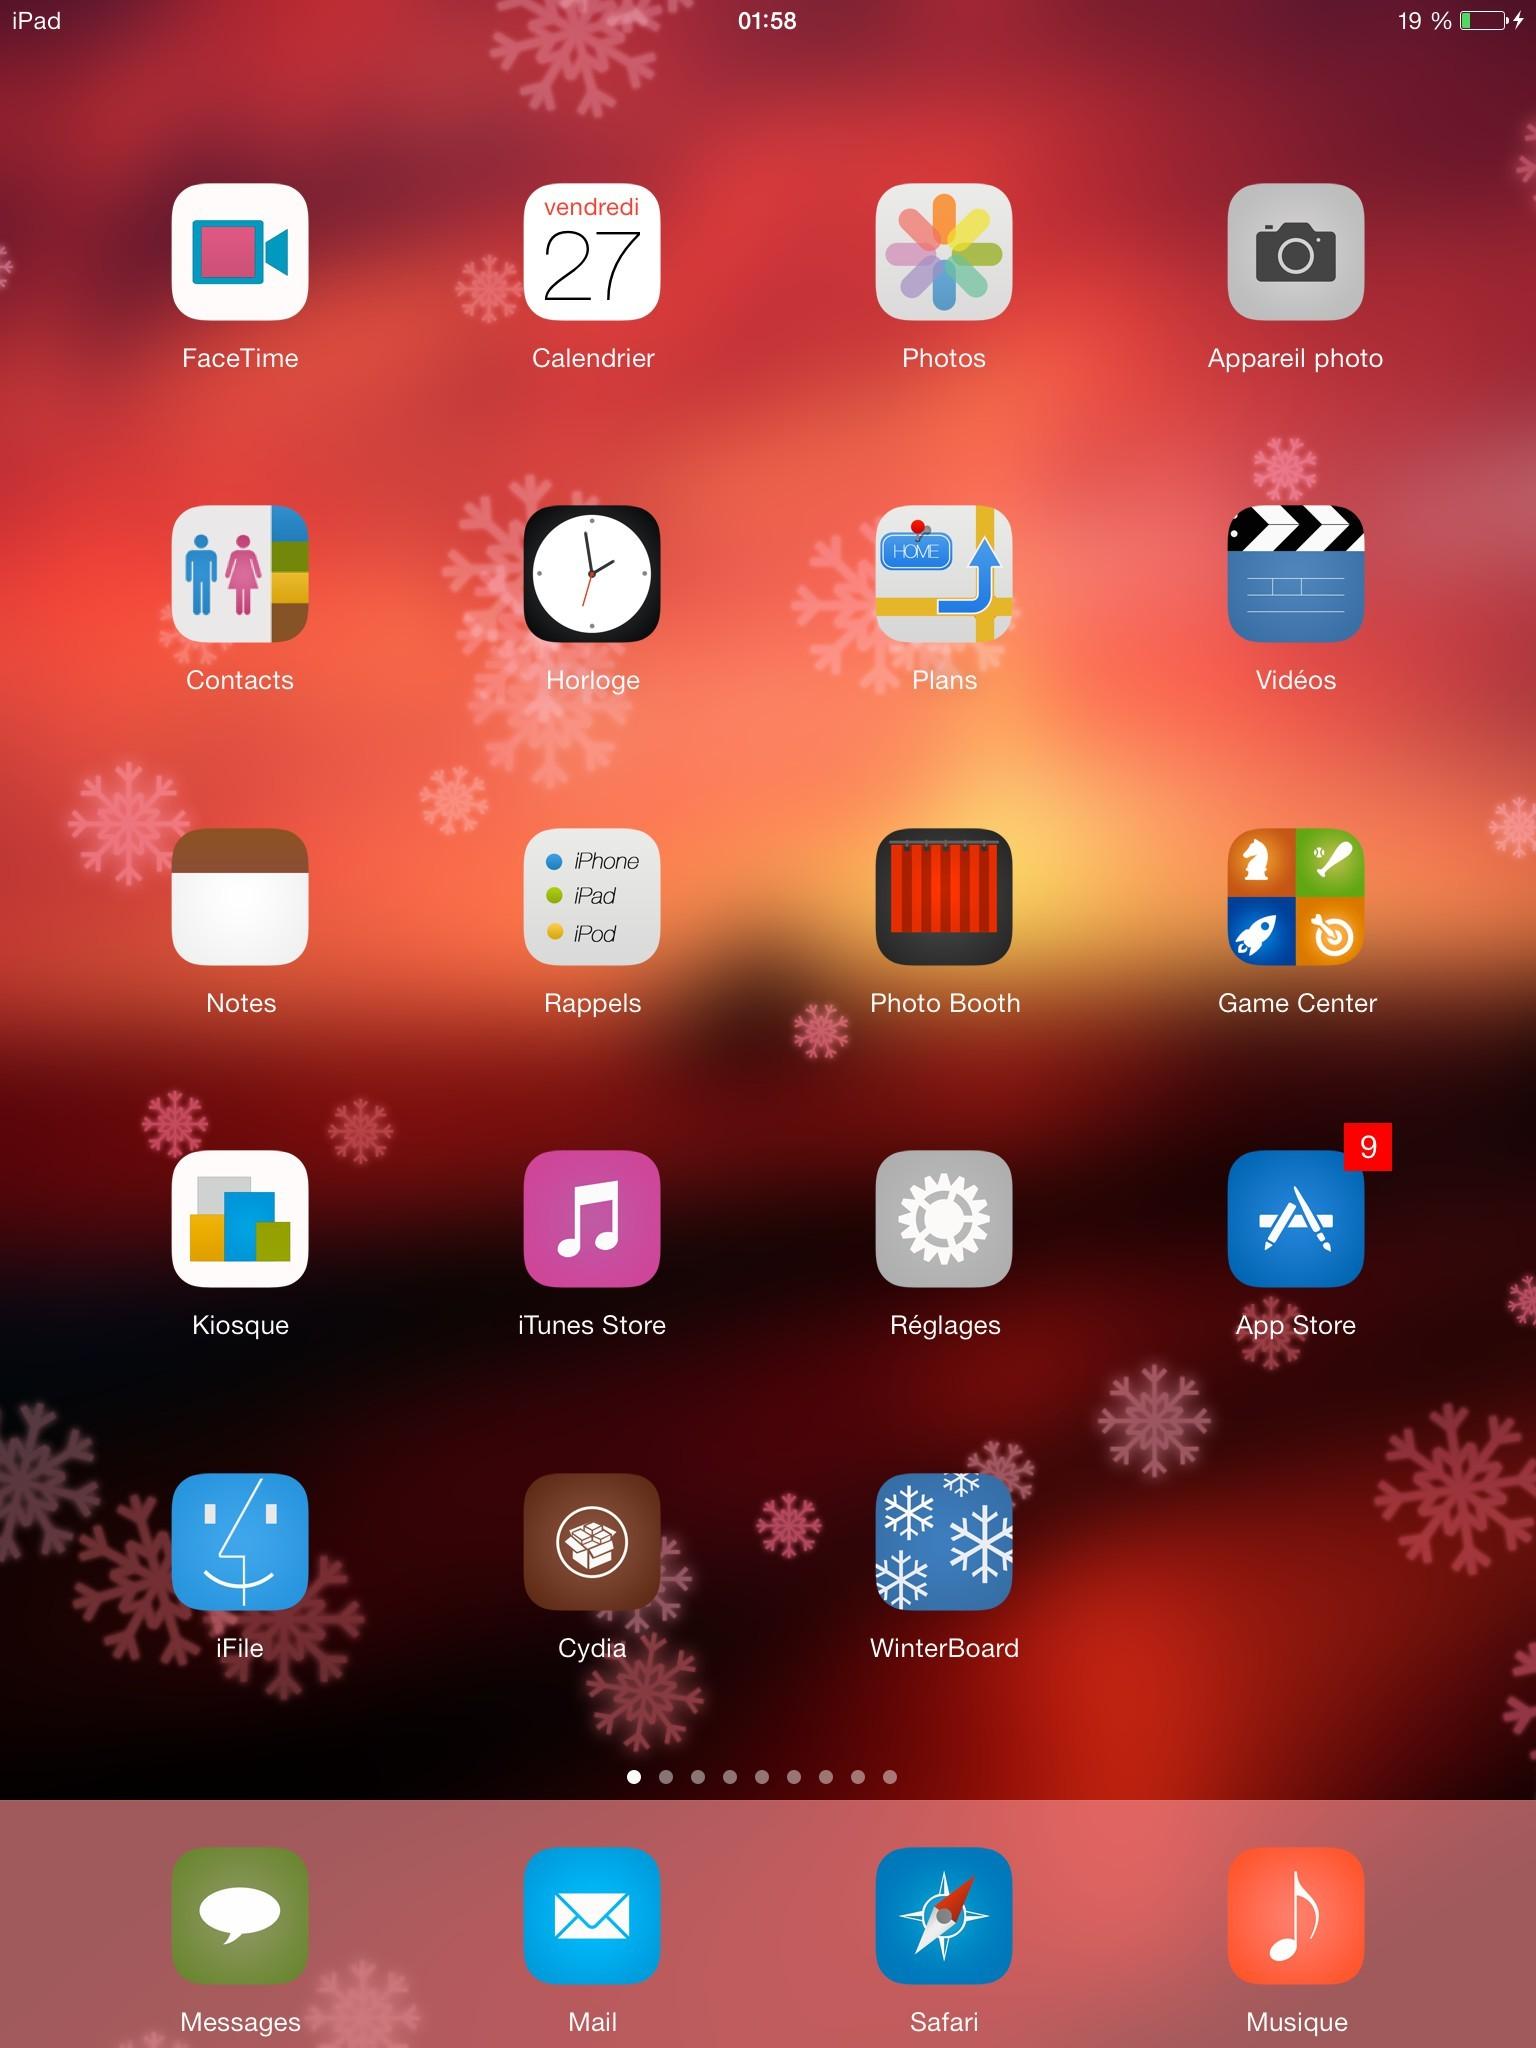 Dynamic Wallpaper iPad (68+ images)